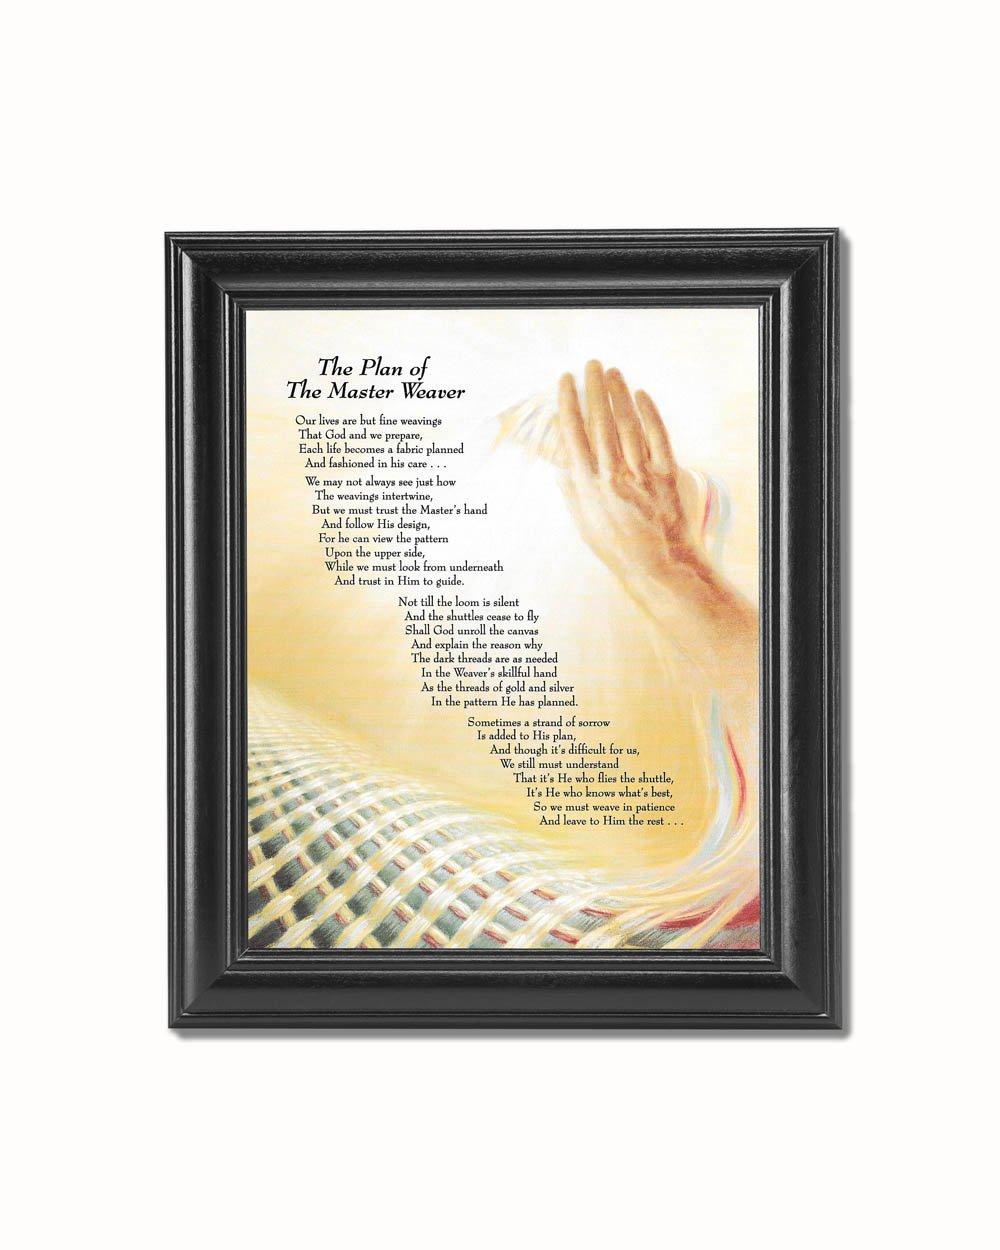 Amazon.com: Plan of the Master Weaver Christian Religious Black ...